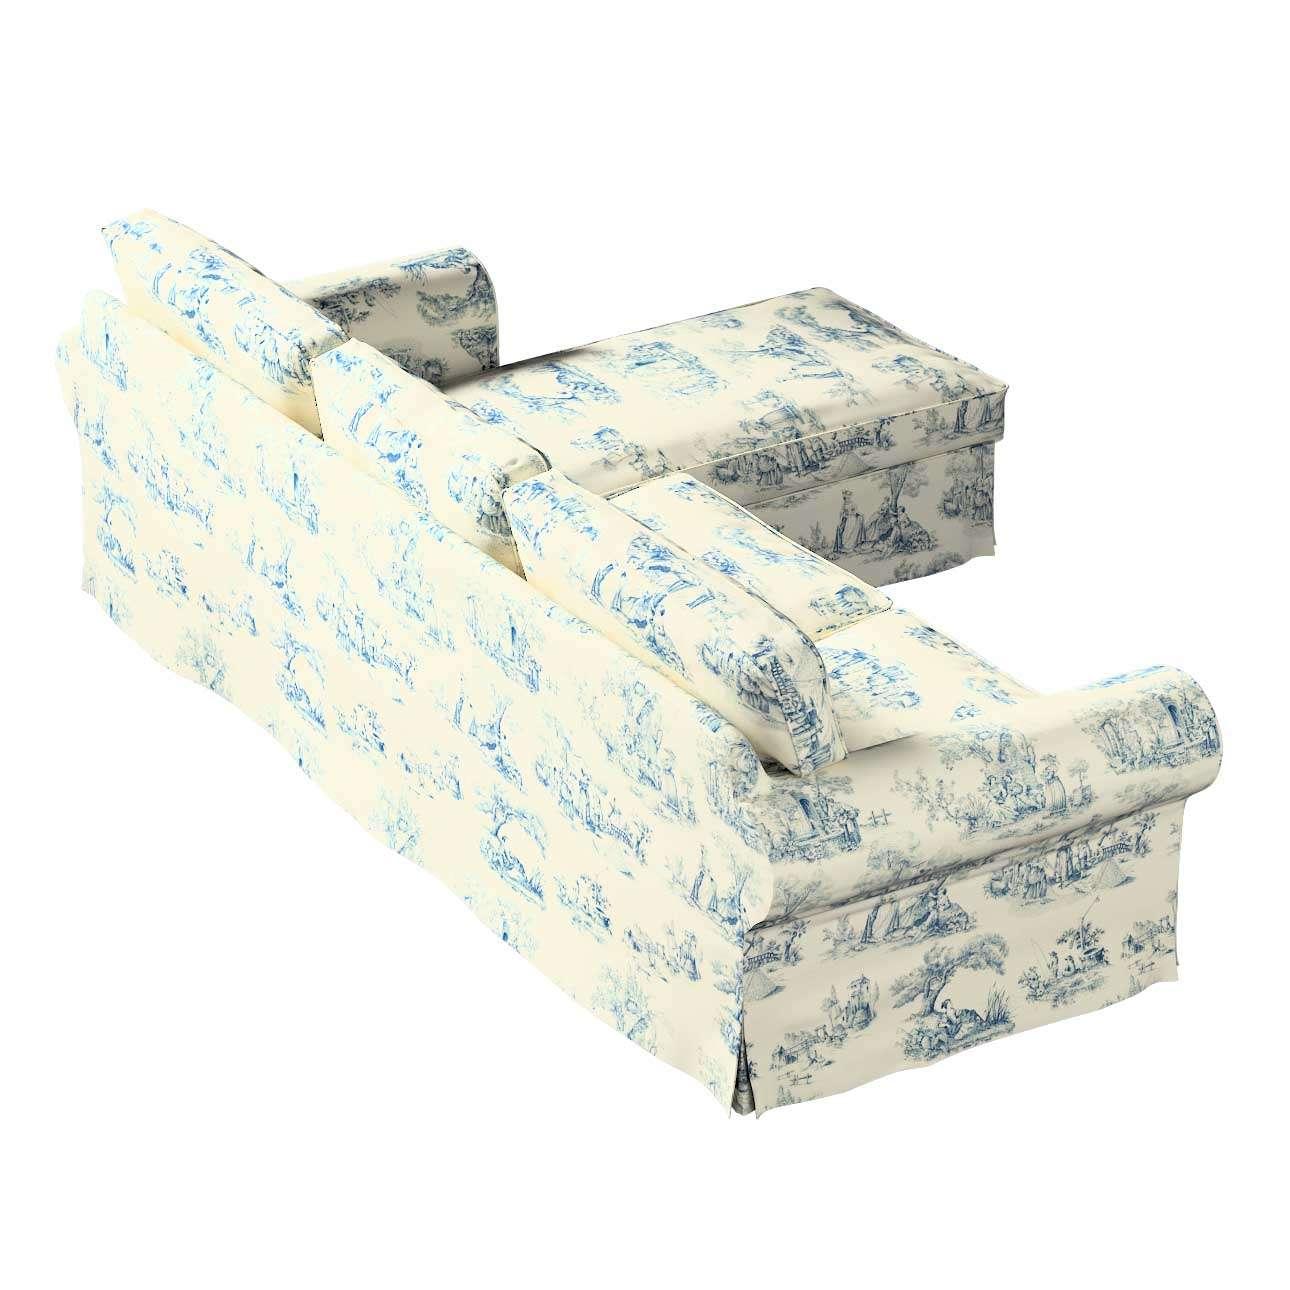 Ektorp 2-Sitzer Sofabezug mit Recamiere Ektorp 2-Sitzer Sofabezug mit Recamiere von der Kollektion Avinon, Stoff: 132-66